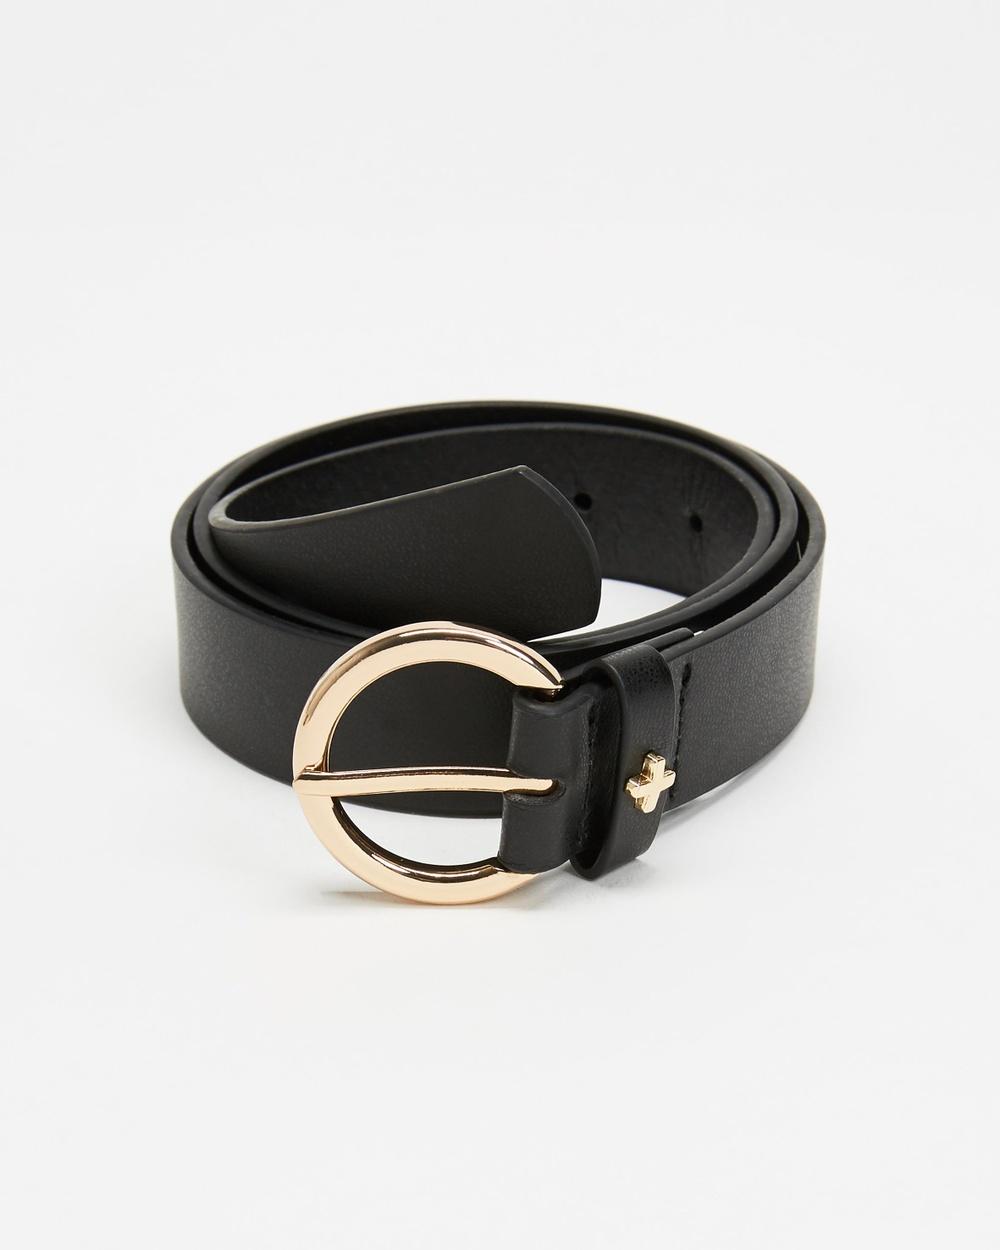 PETA AND JAIN Sinatra Belts Black & Gold